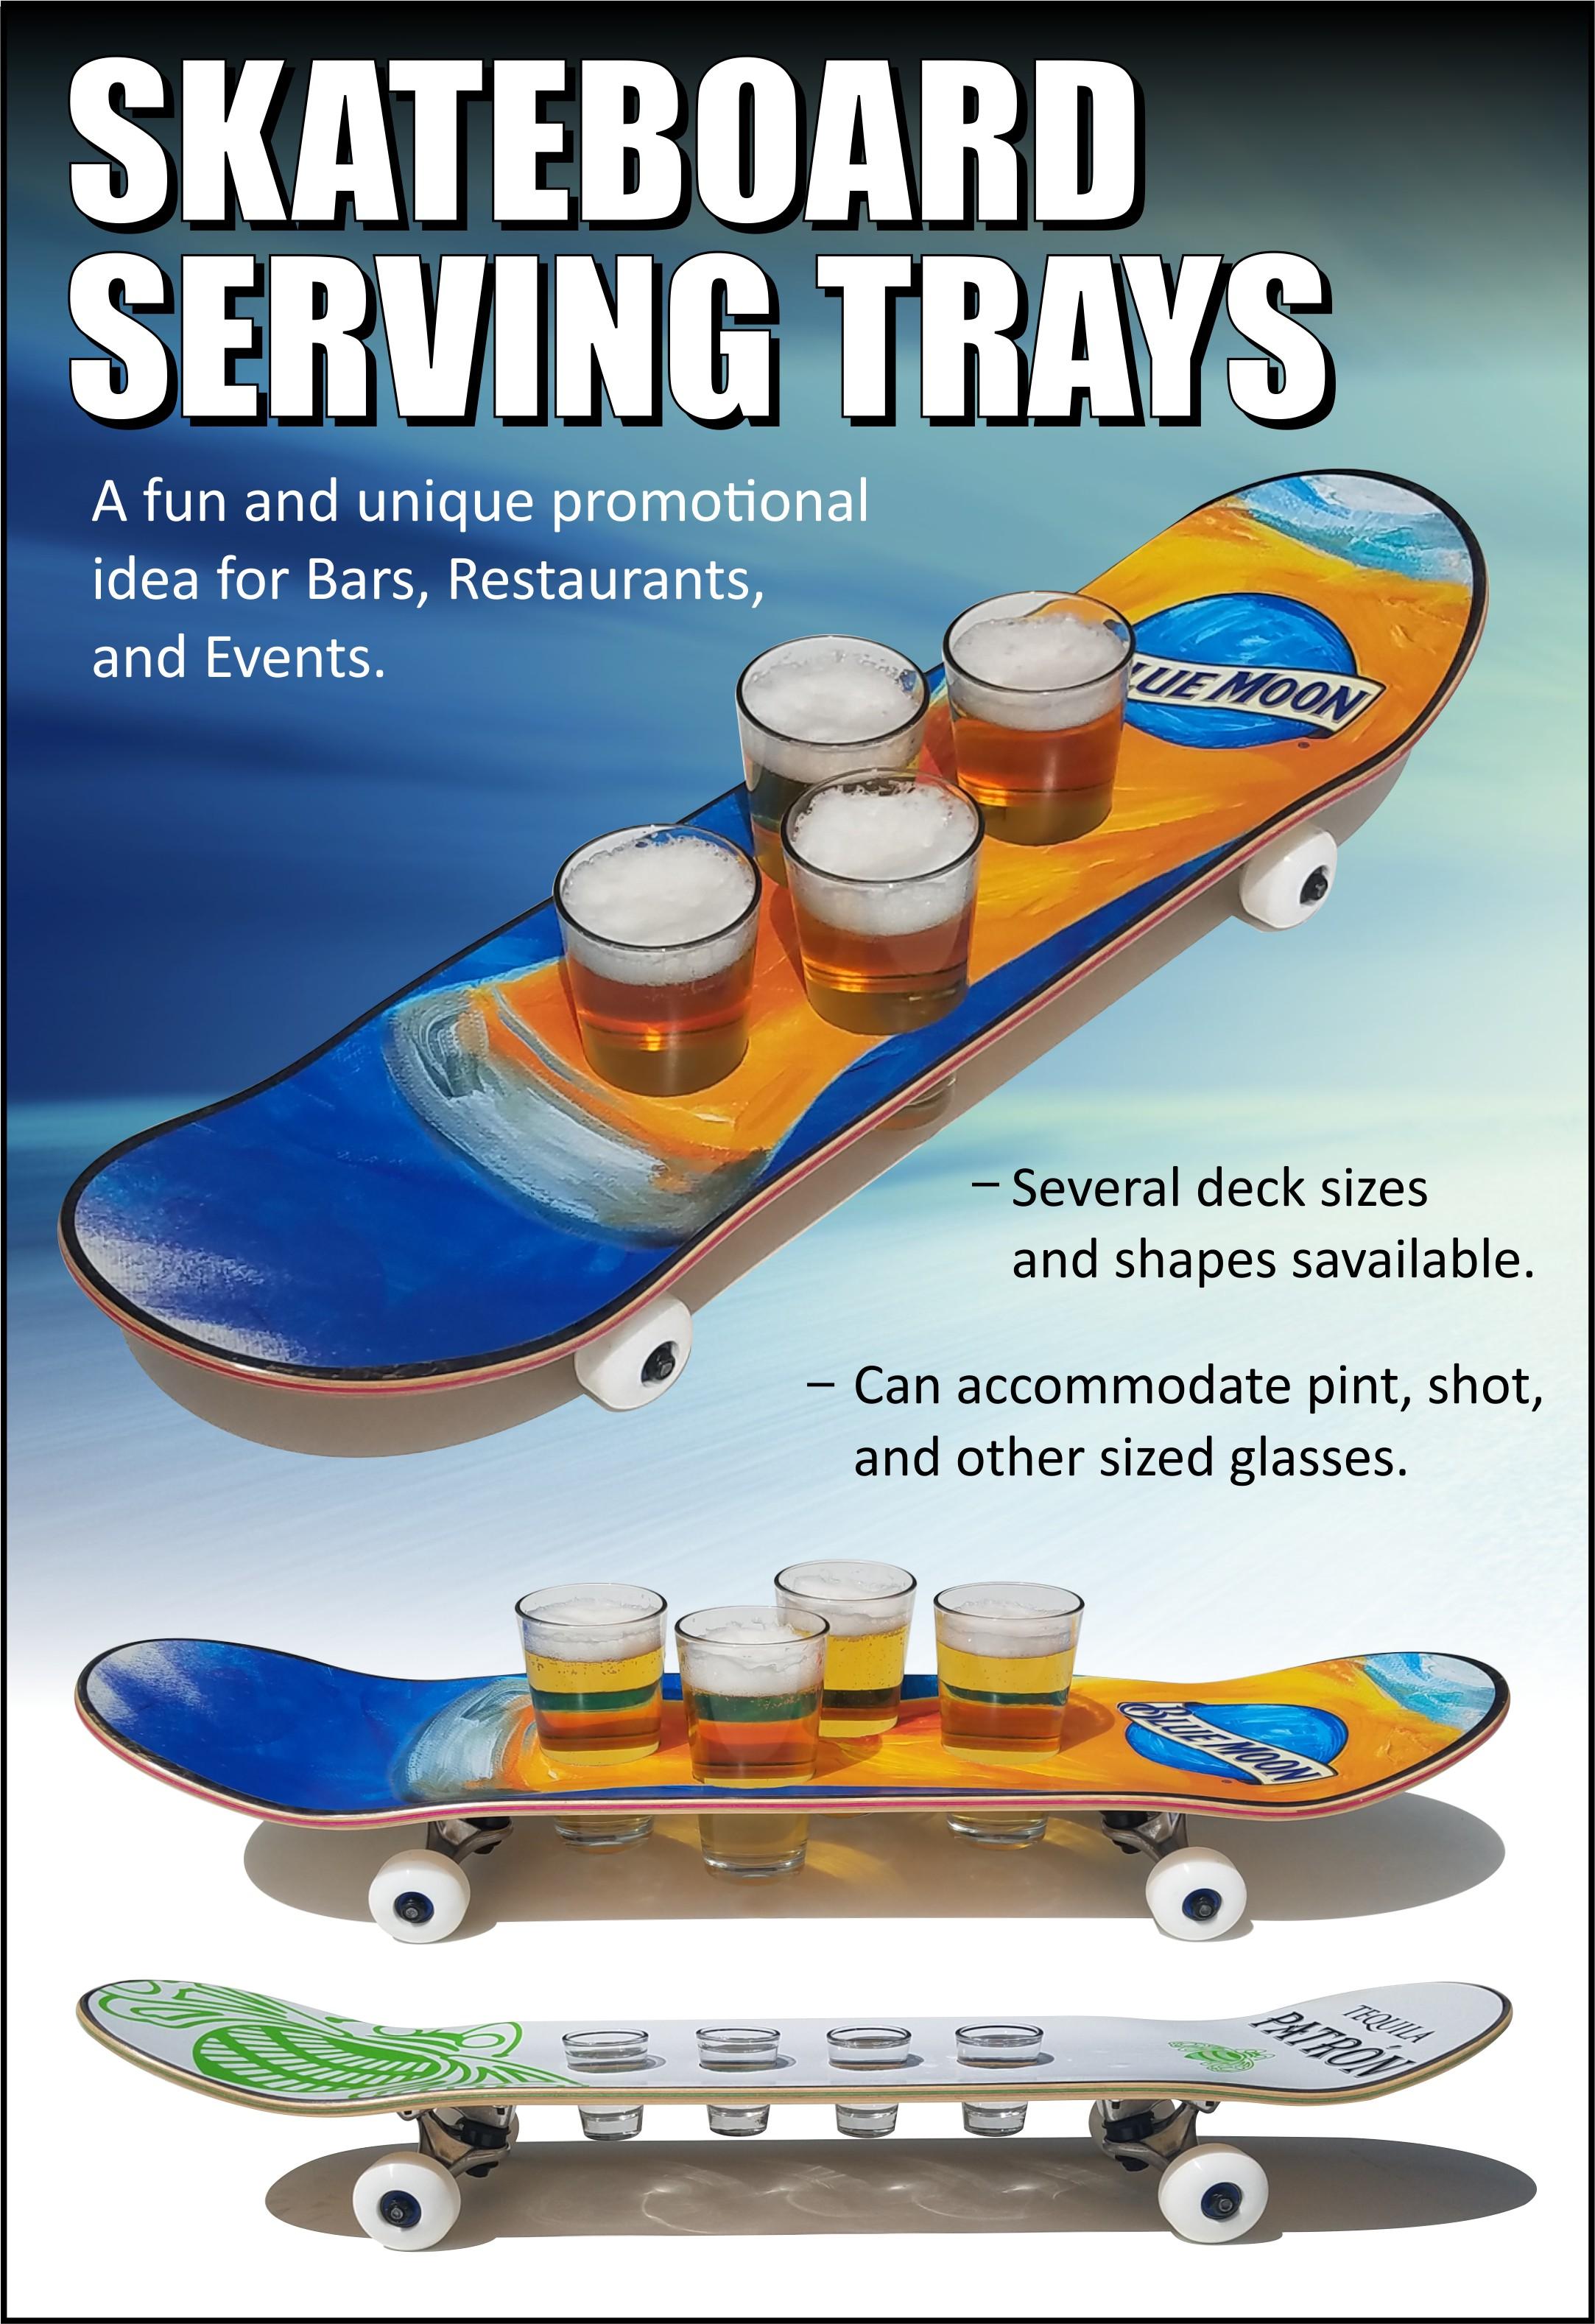 Serving Skateboards - Product Sheet.jpg